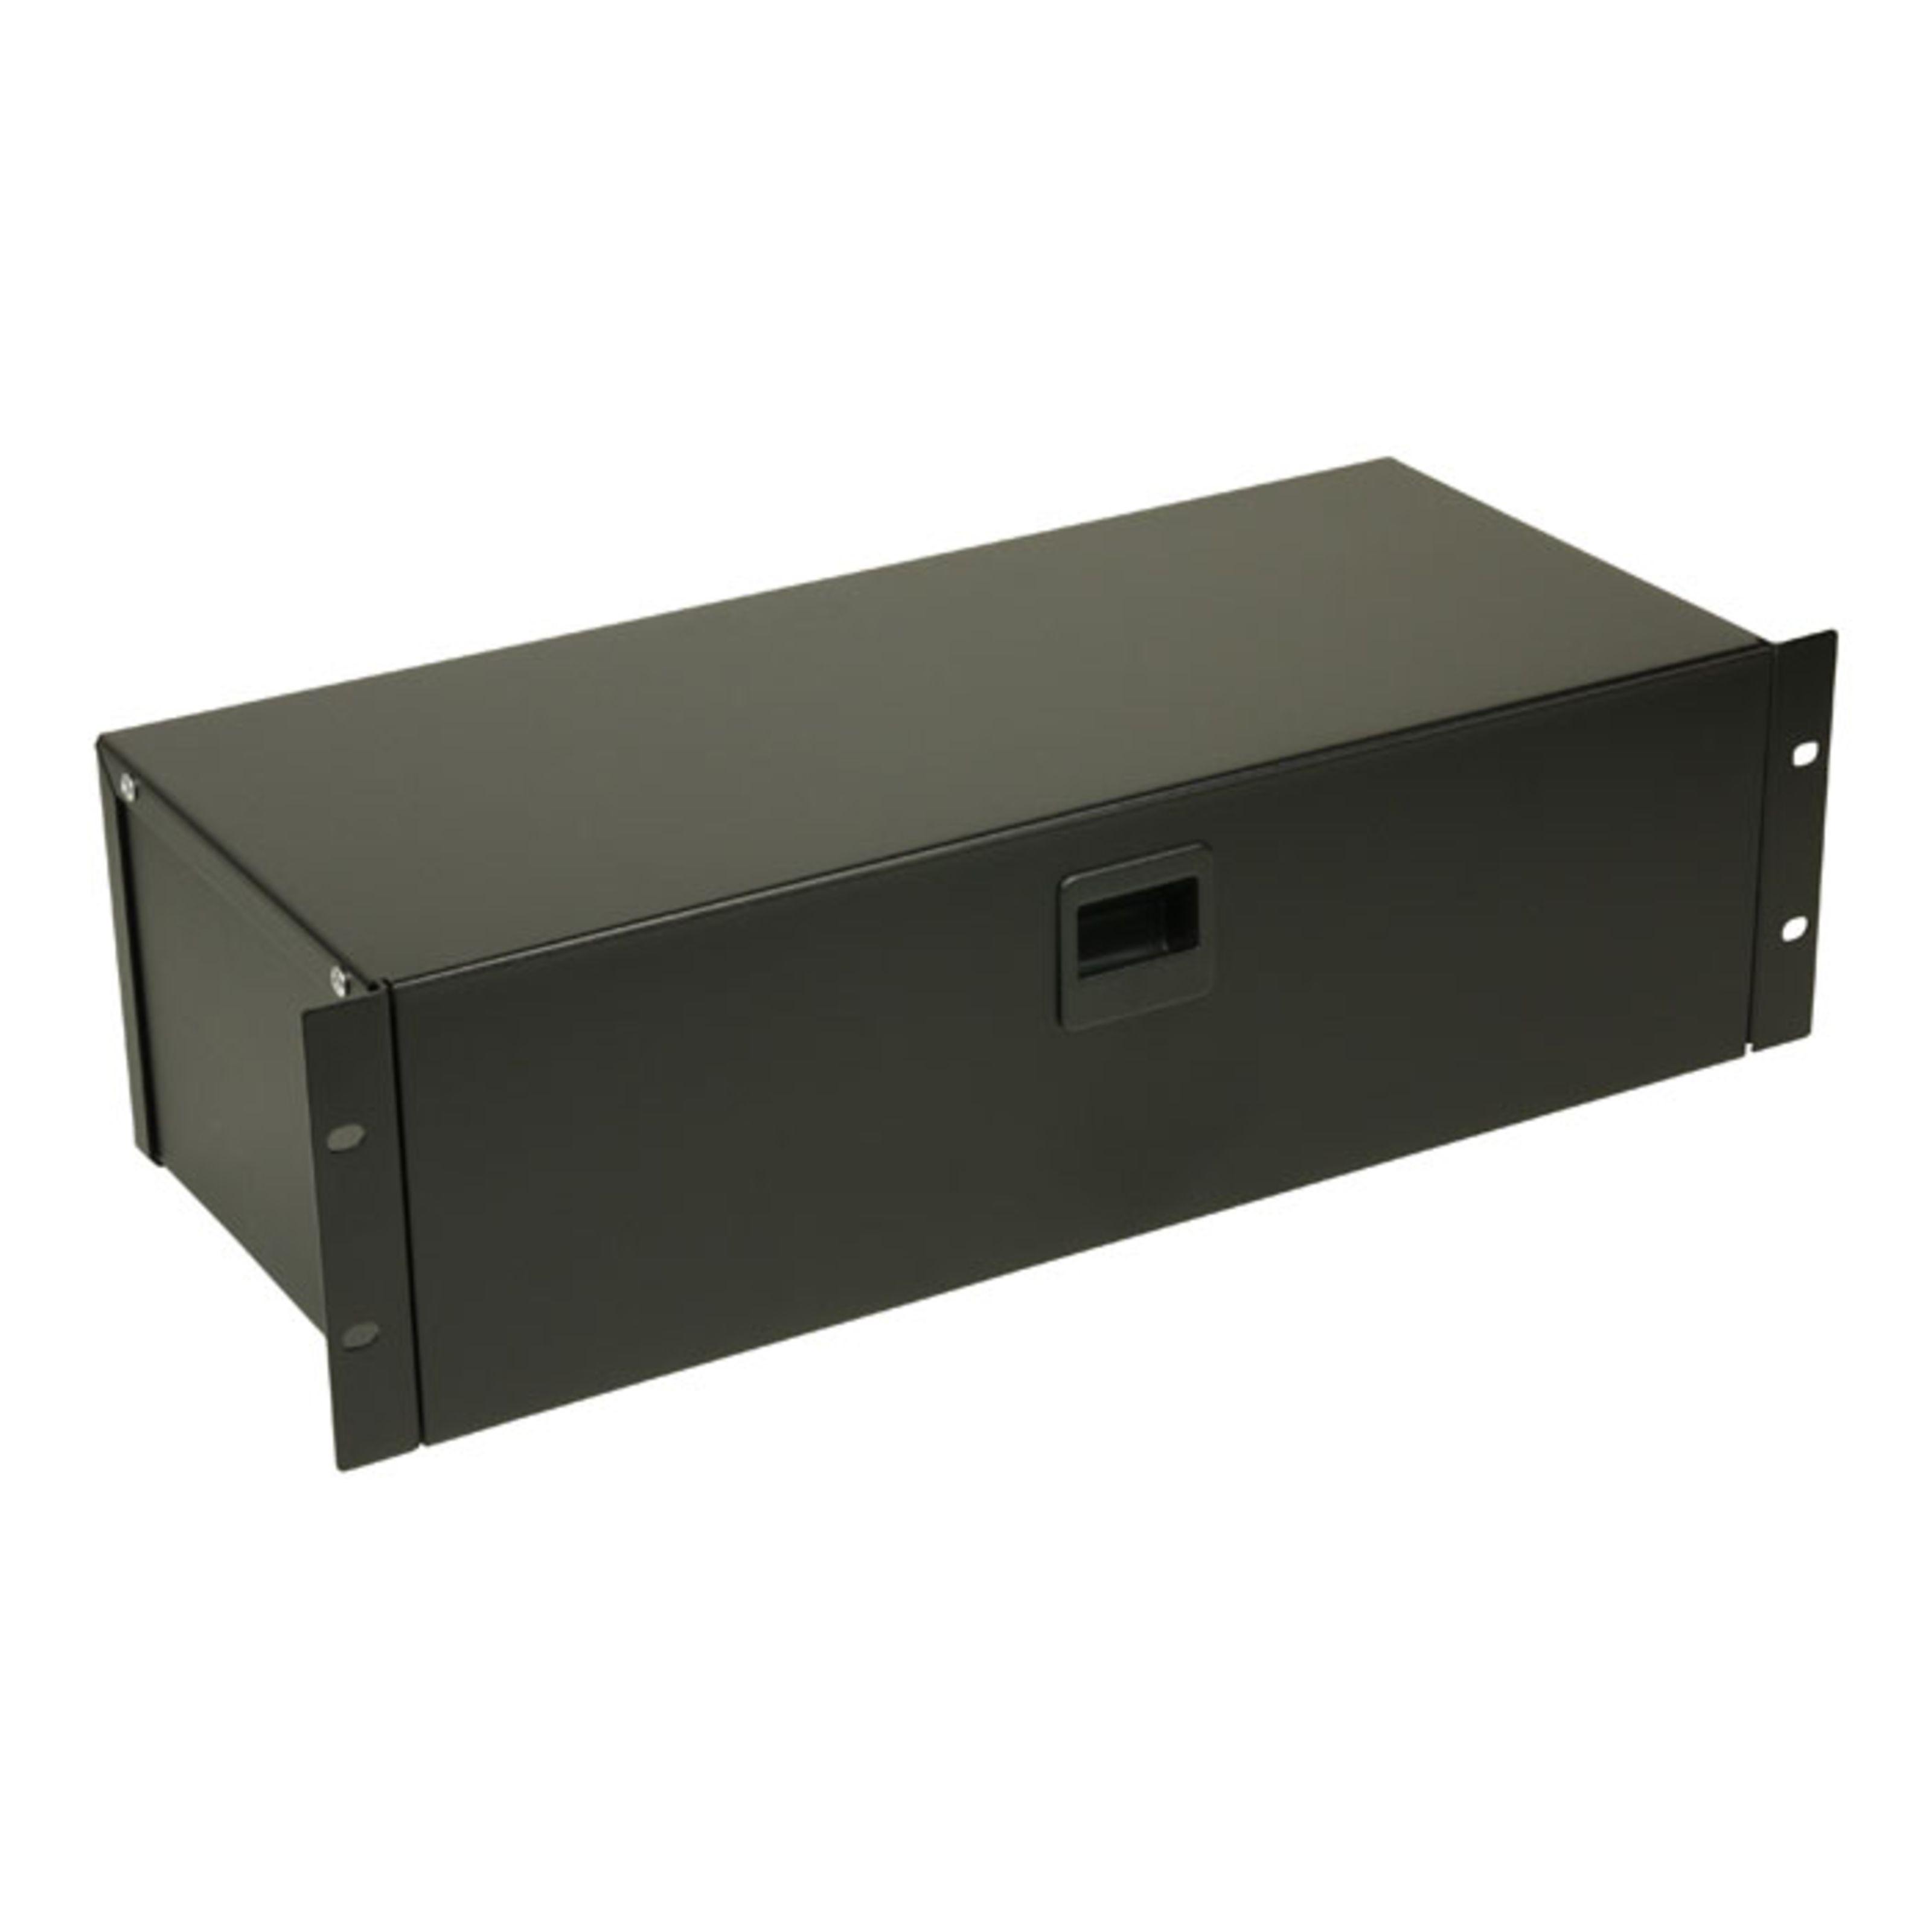 Adam Hall - 87303 - 19 Rackbox 3HE mit Schnappverschluss